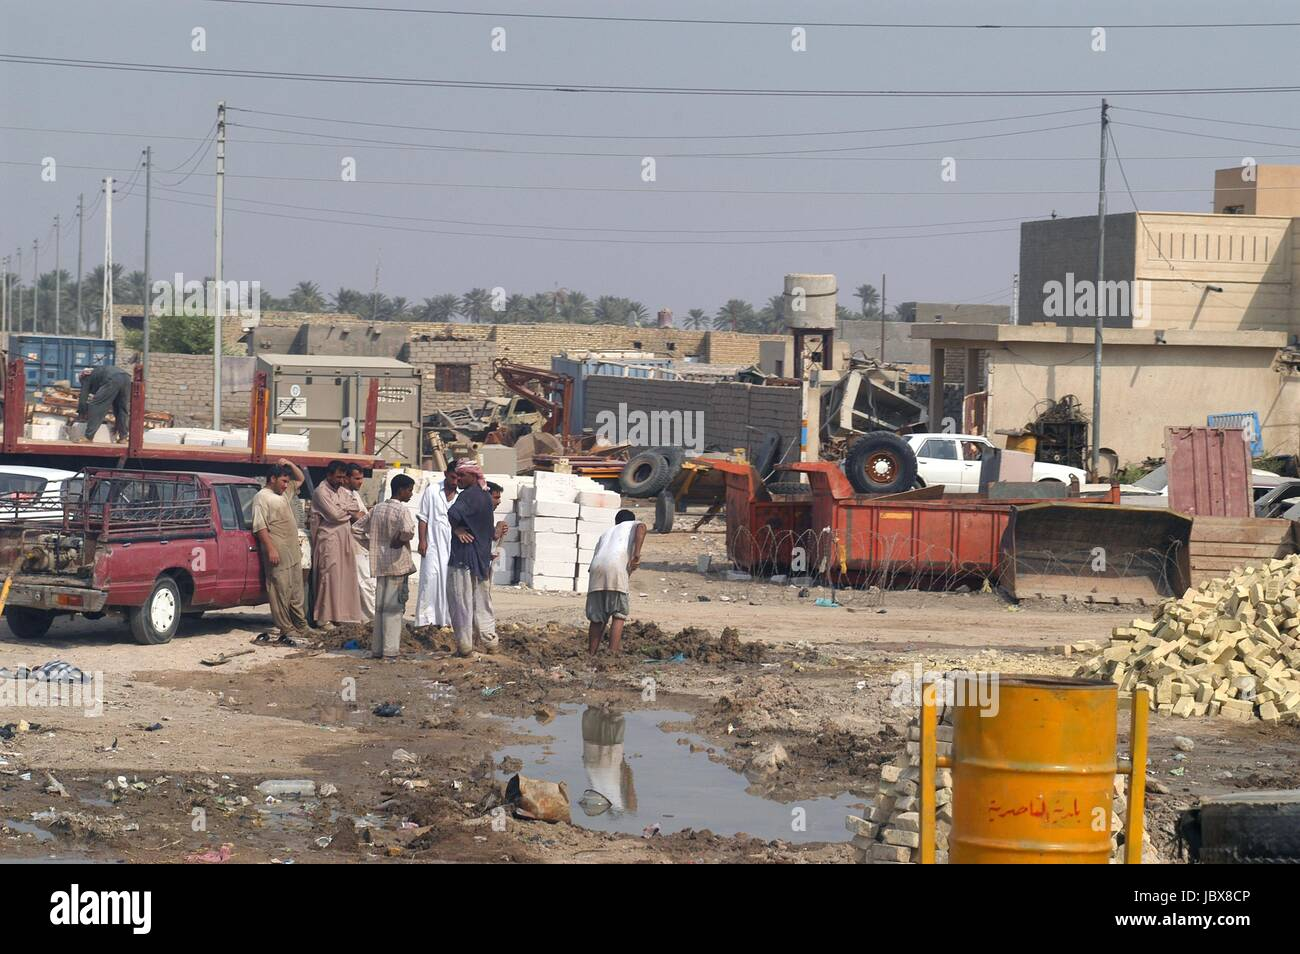 Iraq, the outskirts of Nassiriya town - Stock Image